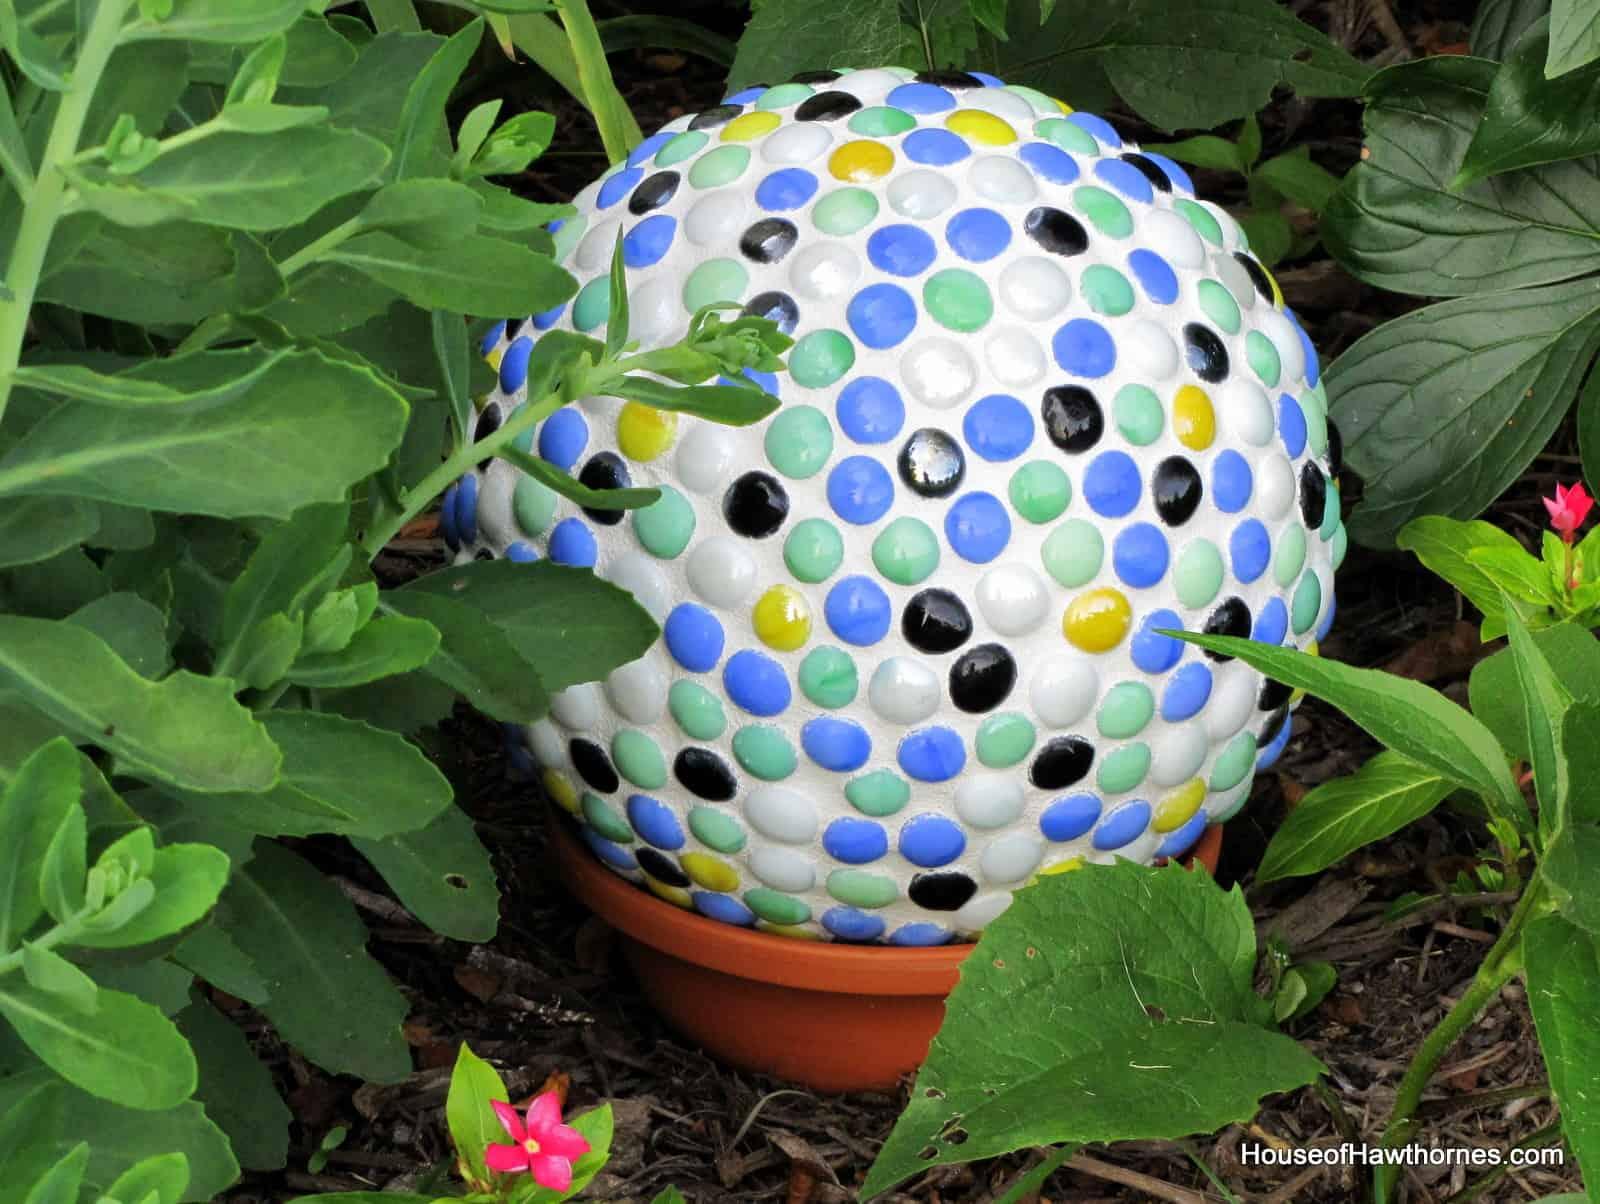 Caulking and marble mosaic gazing ball